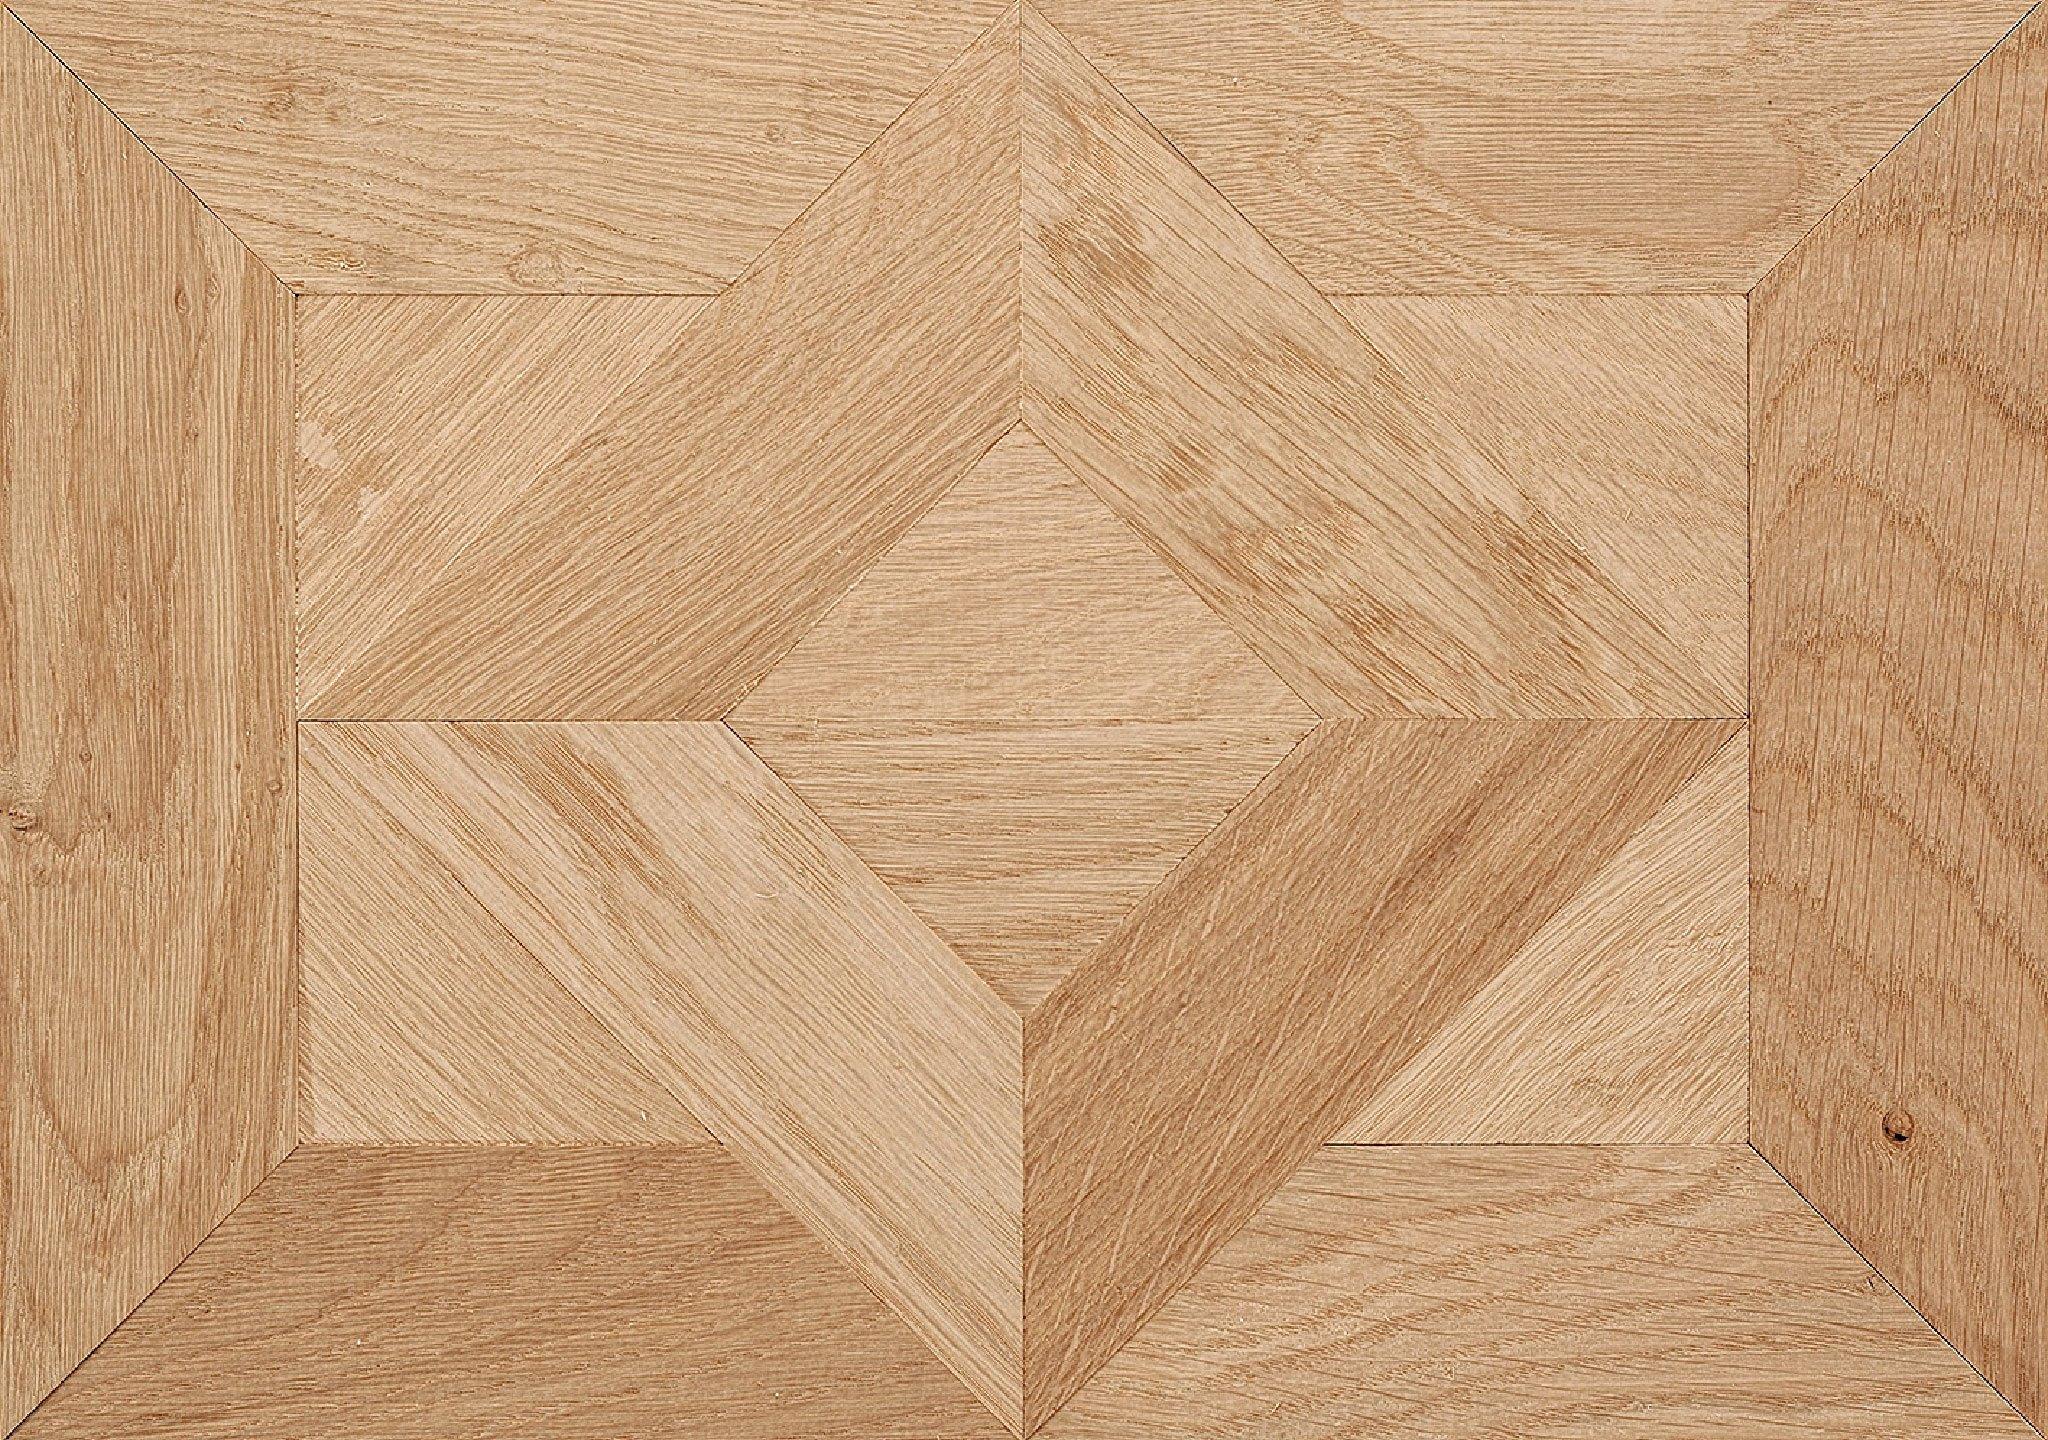 Designparquet oak ancona rustic 10mm